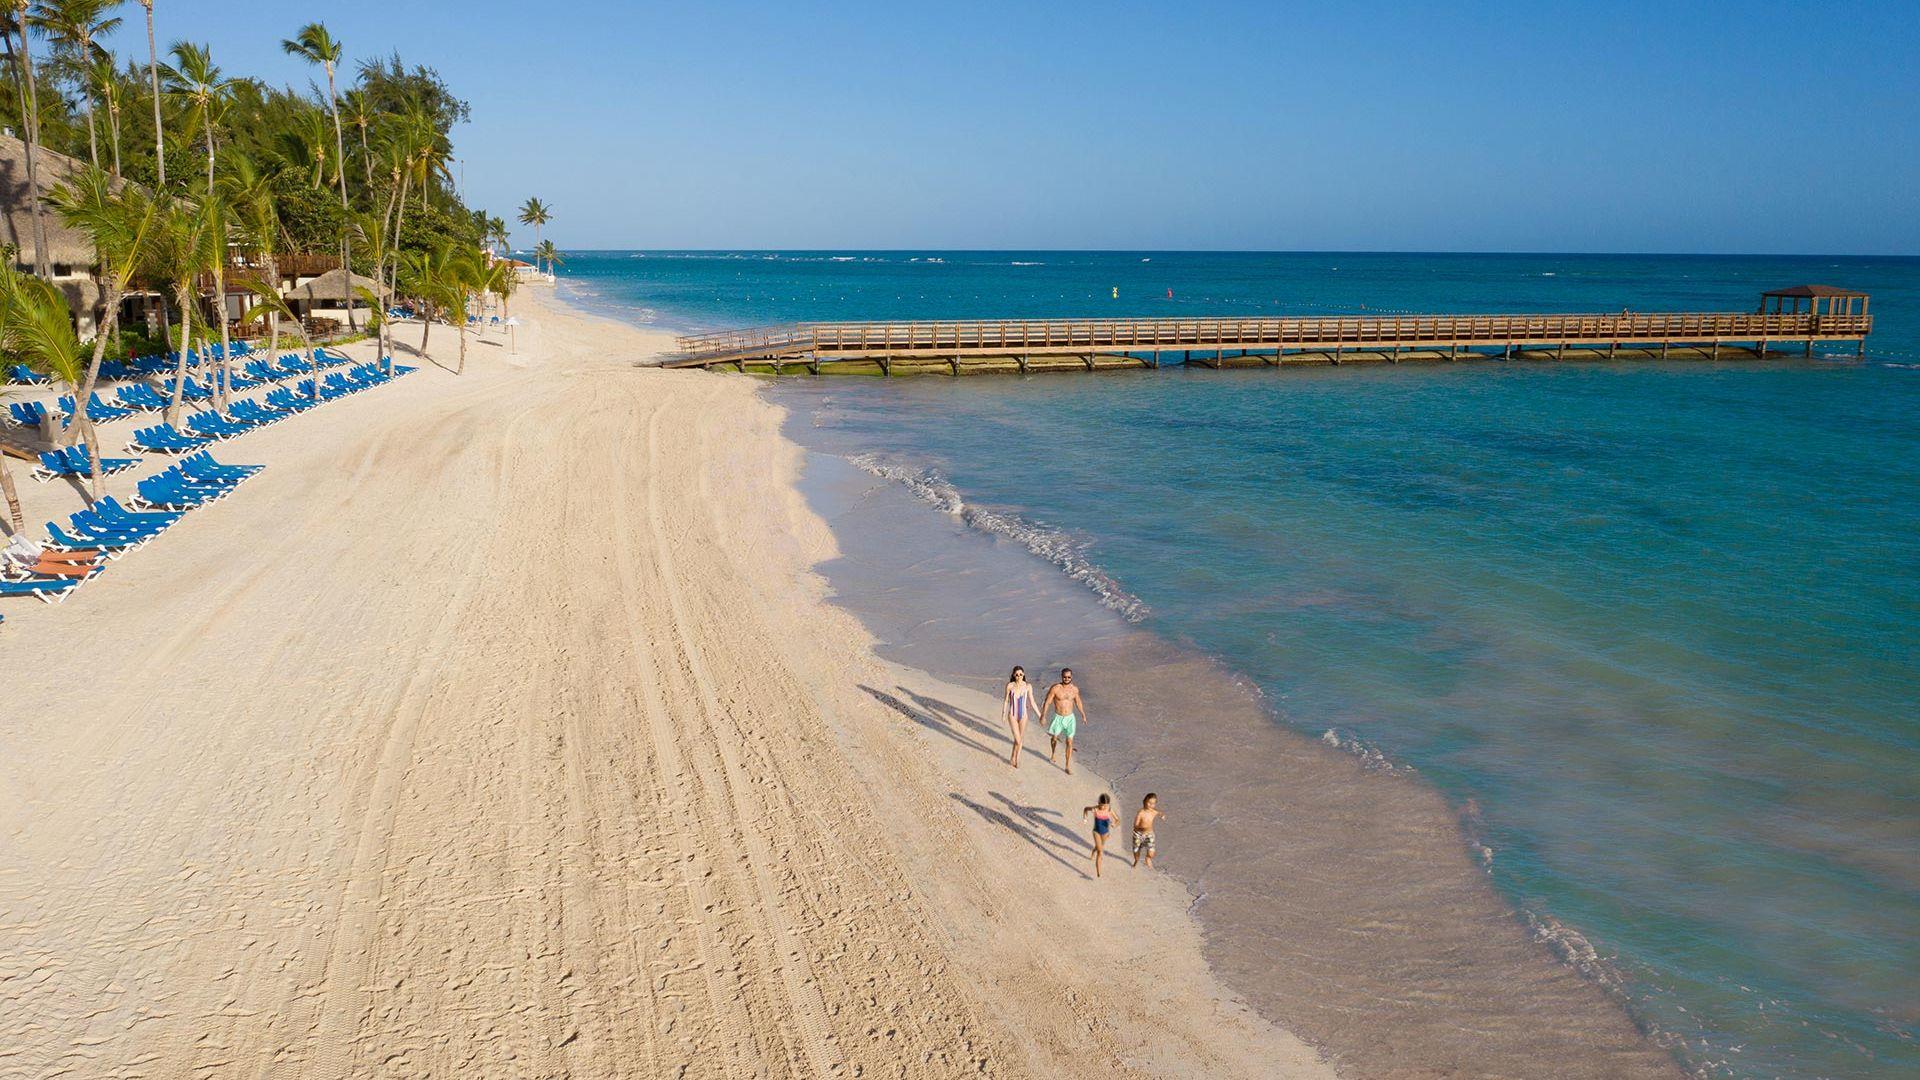 Sejur plaja Punta Cana, 9 zile - aprilie 2022